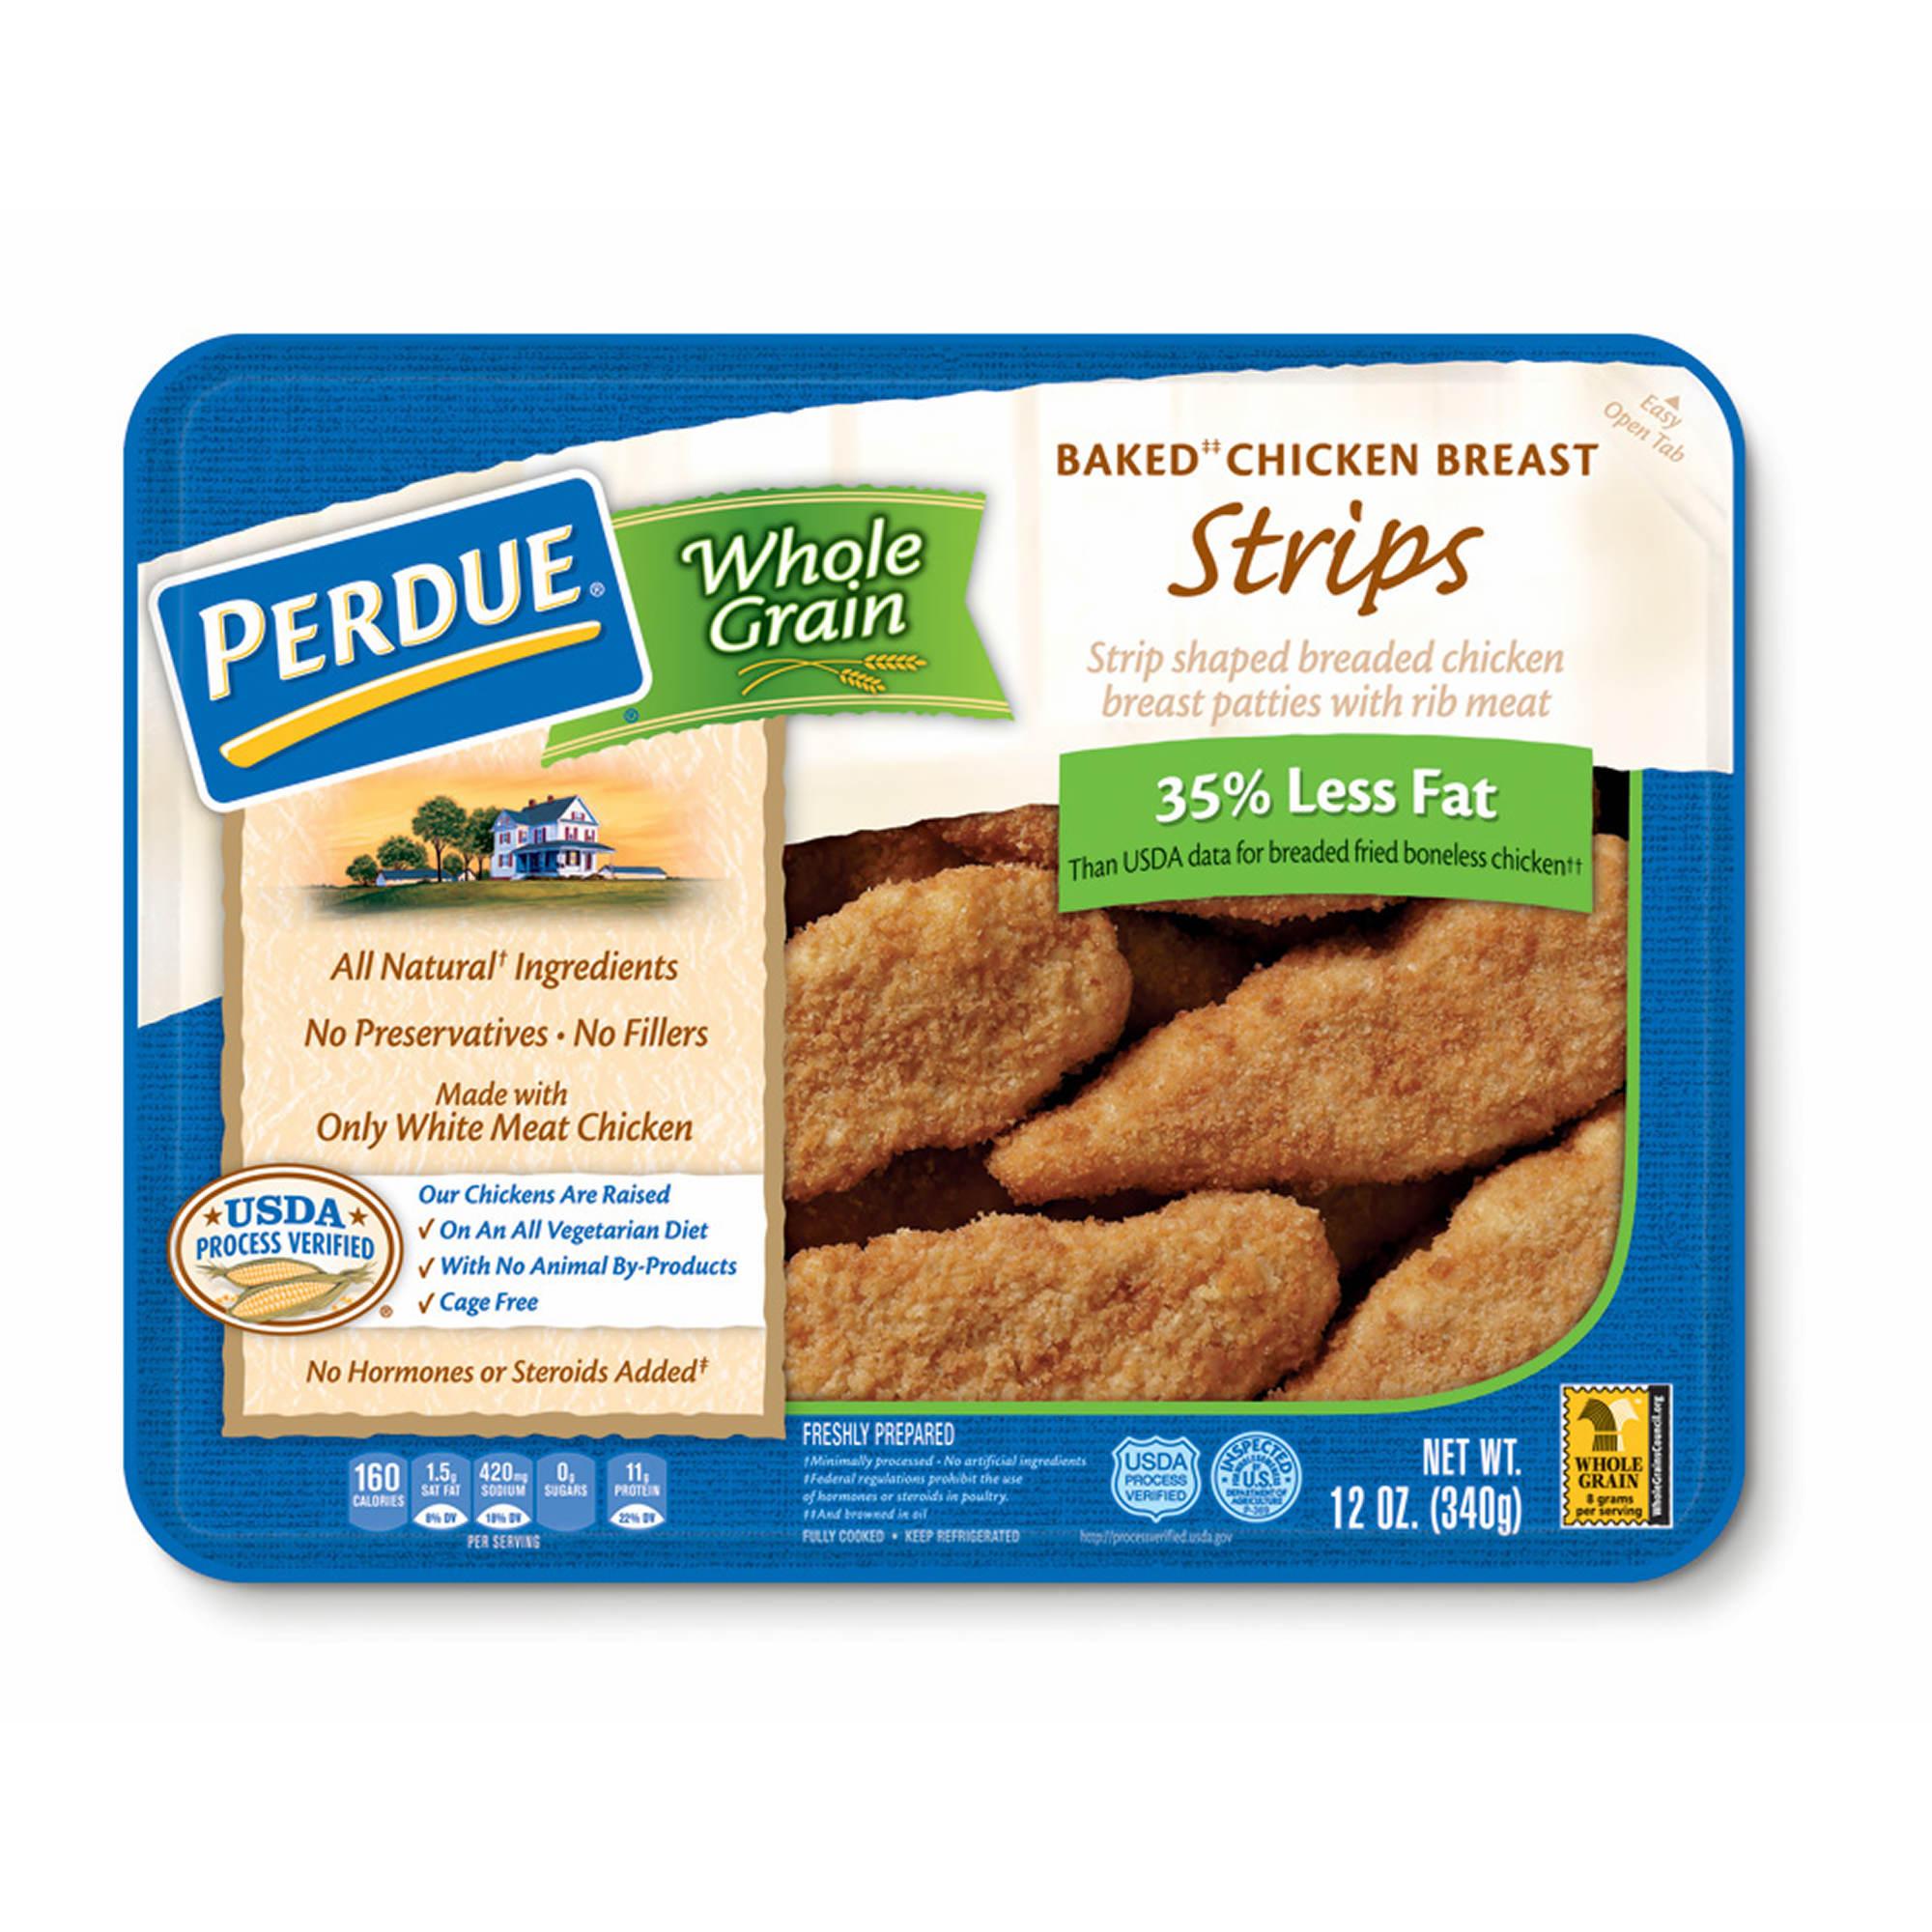 Perdue Whole Grain Breaded Chicken Breast Strips, 12 oz., 3 pk.